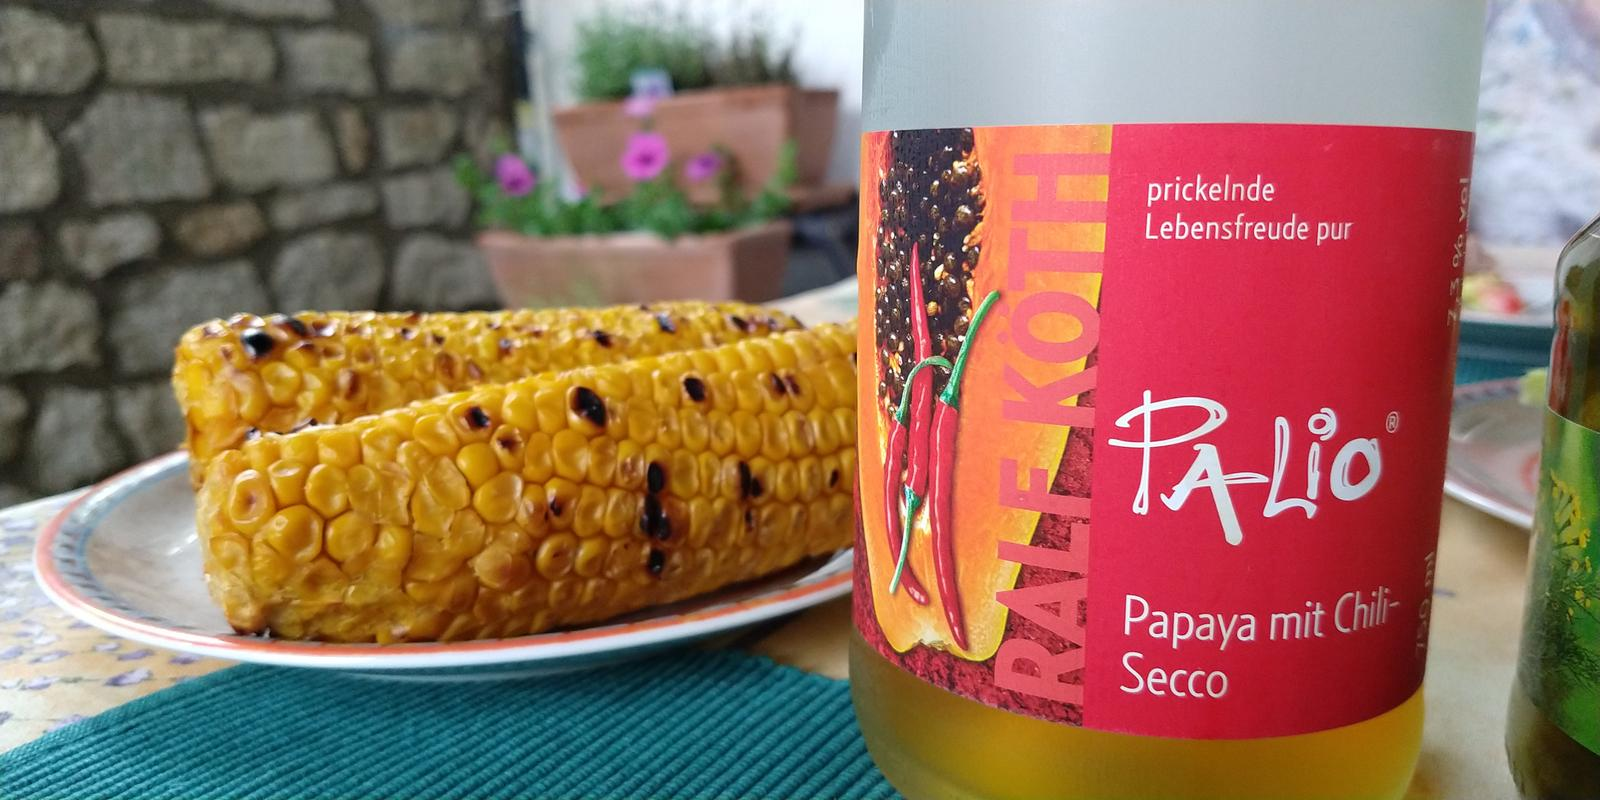 Papaya mit Chili-Secco von Palio